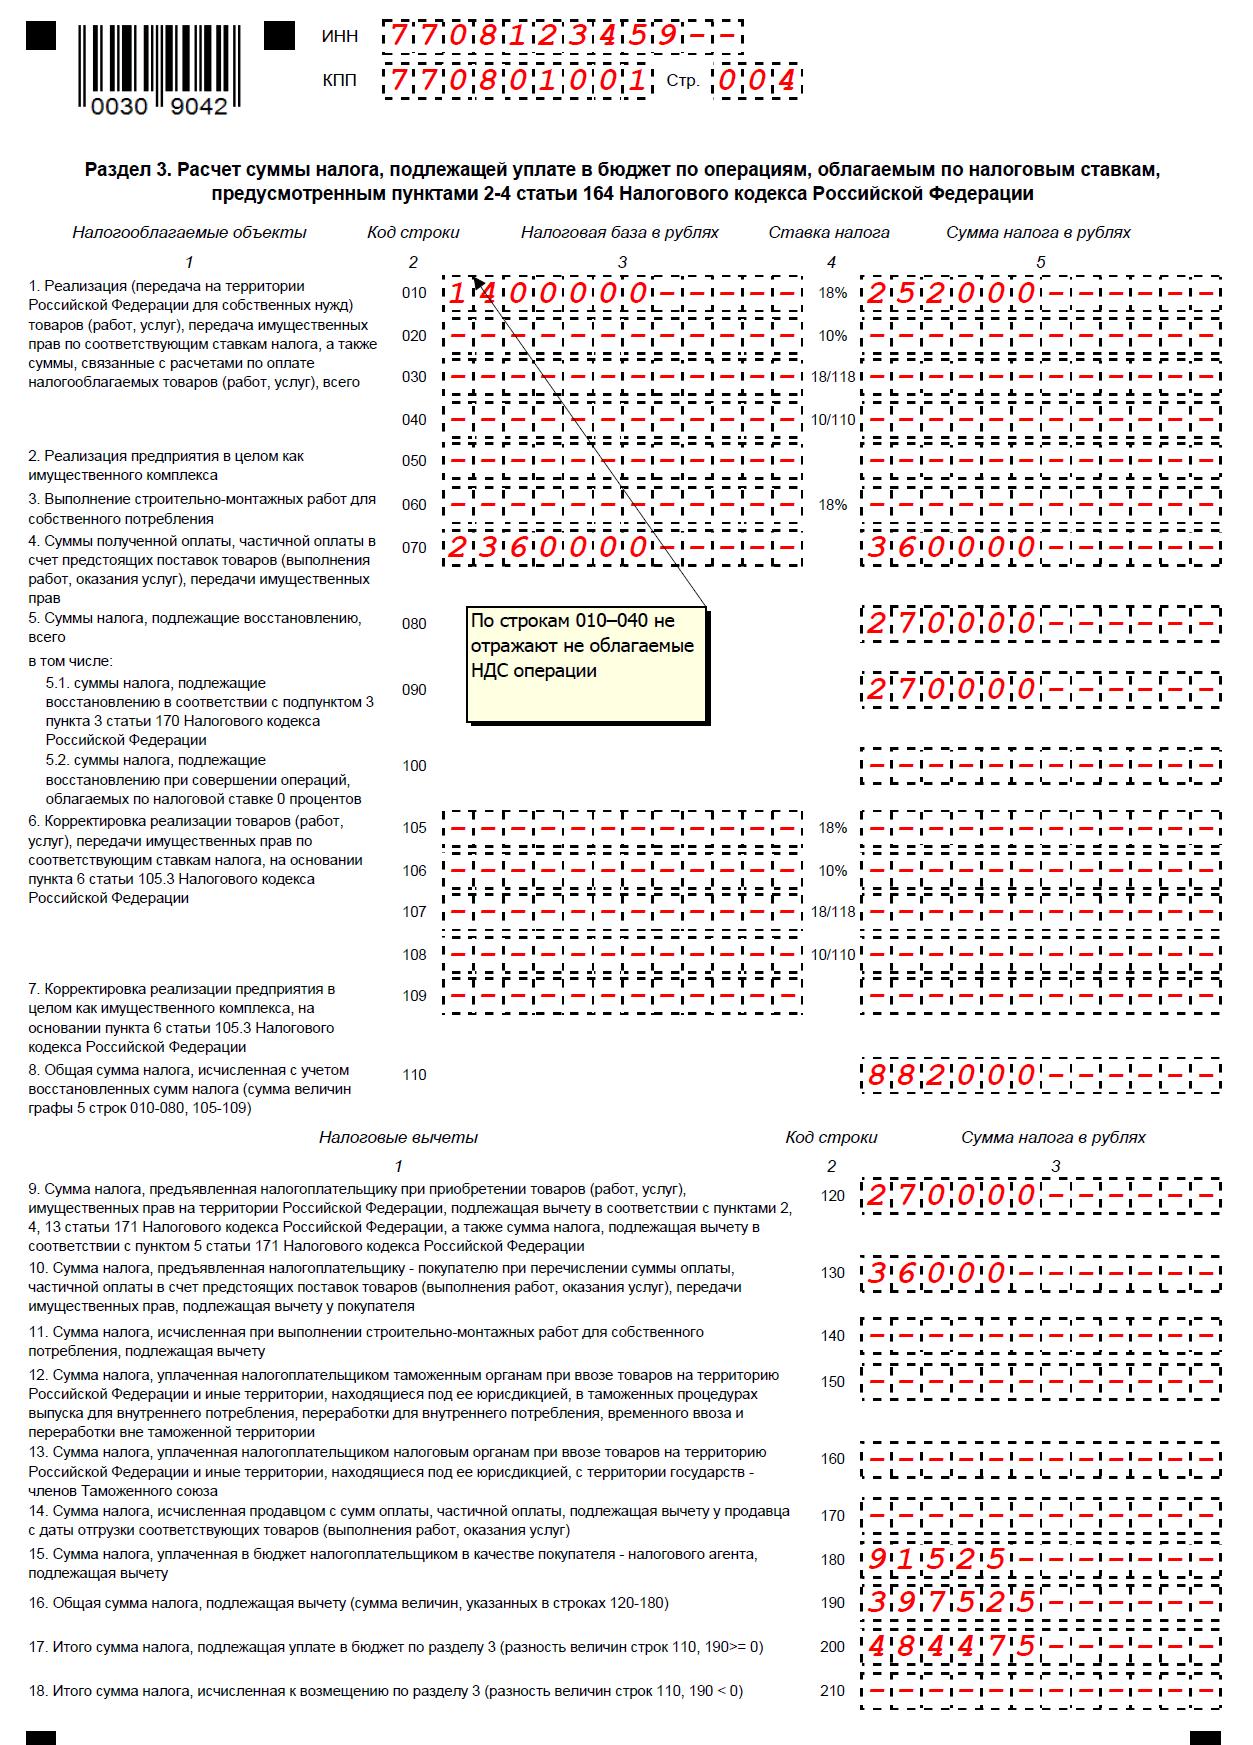 Декларация по НДС за 2 квартал 2016 года пример заполнения